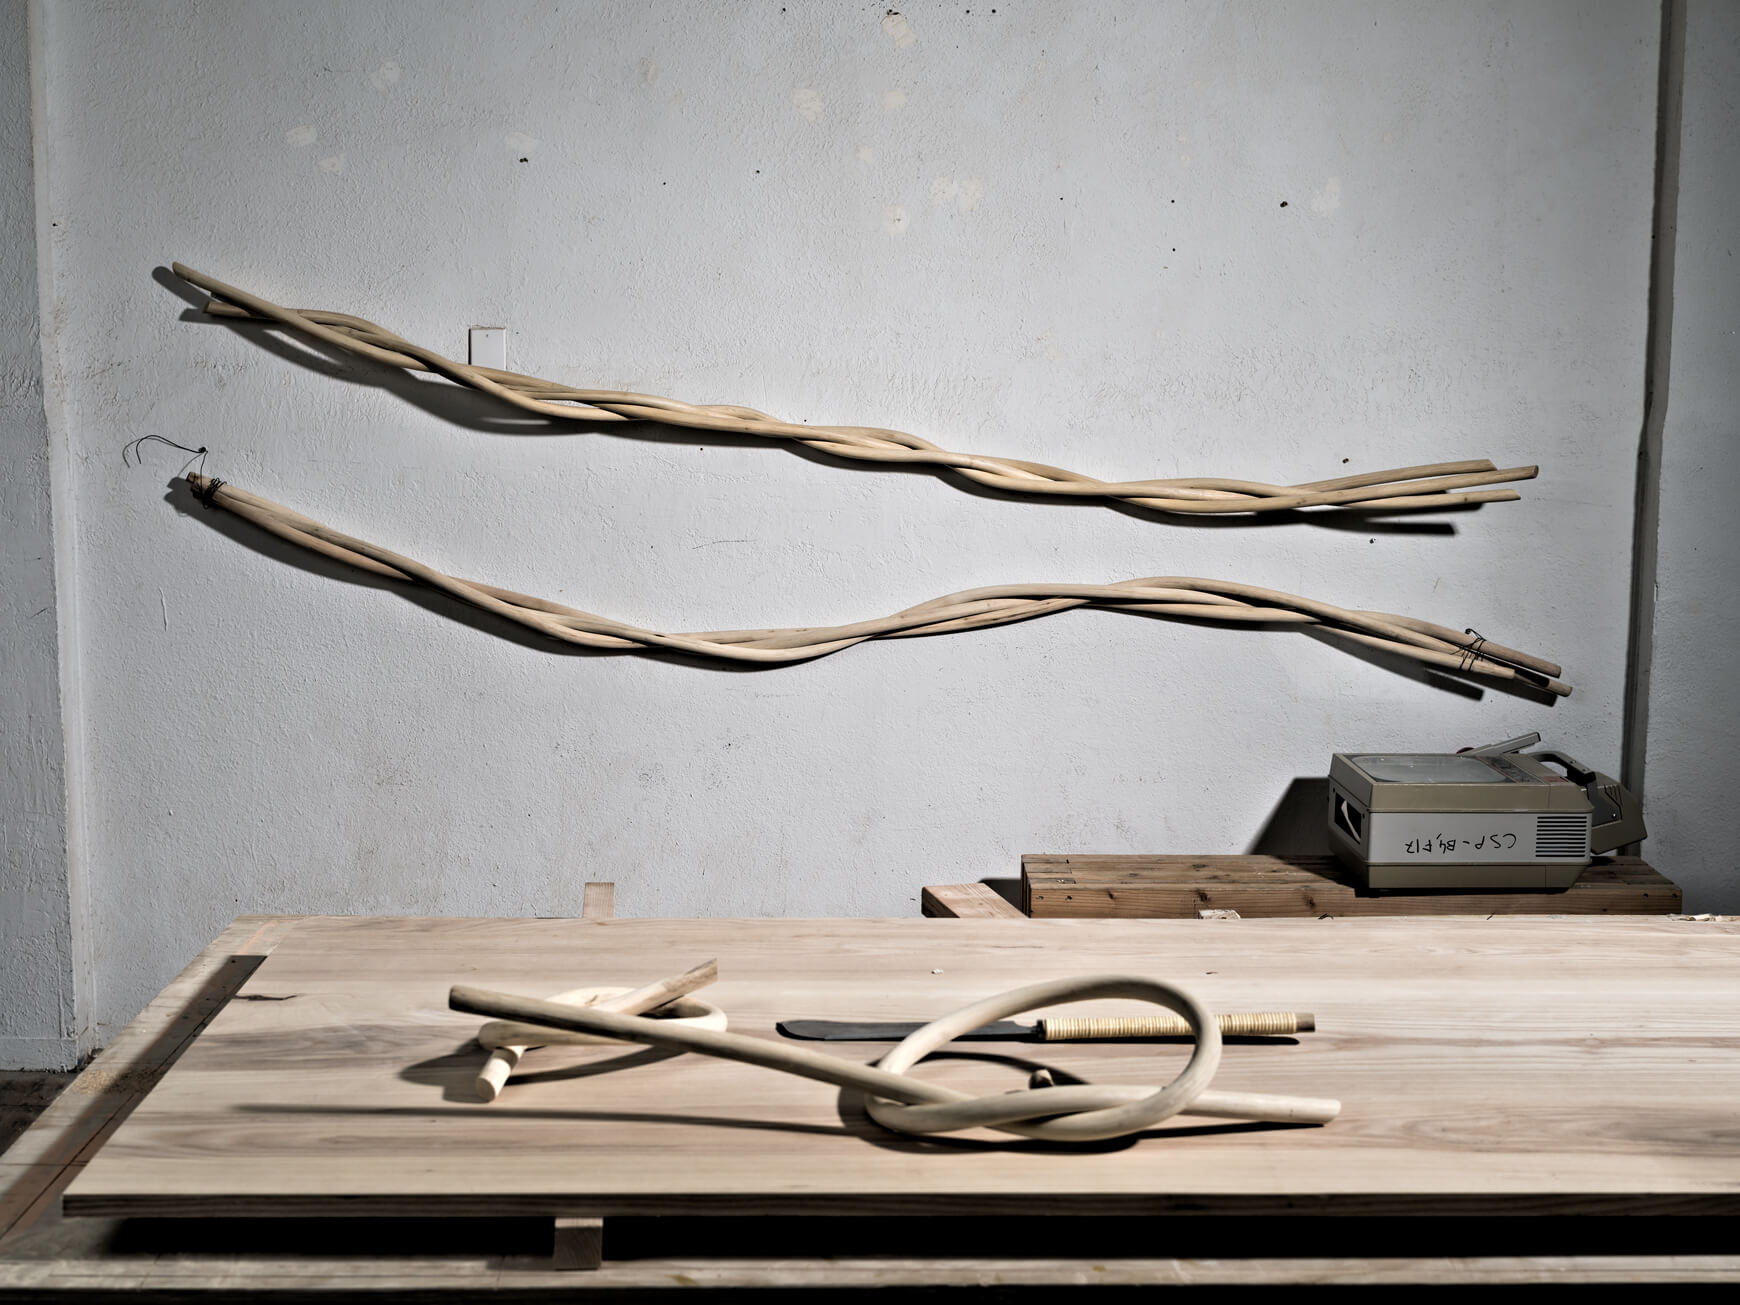 Rattan art on display at Katie Gong's studio